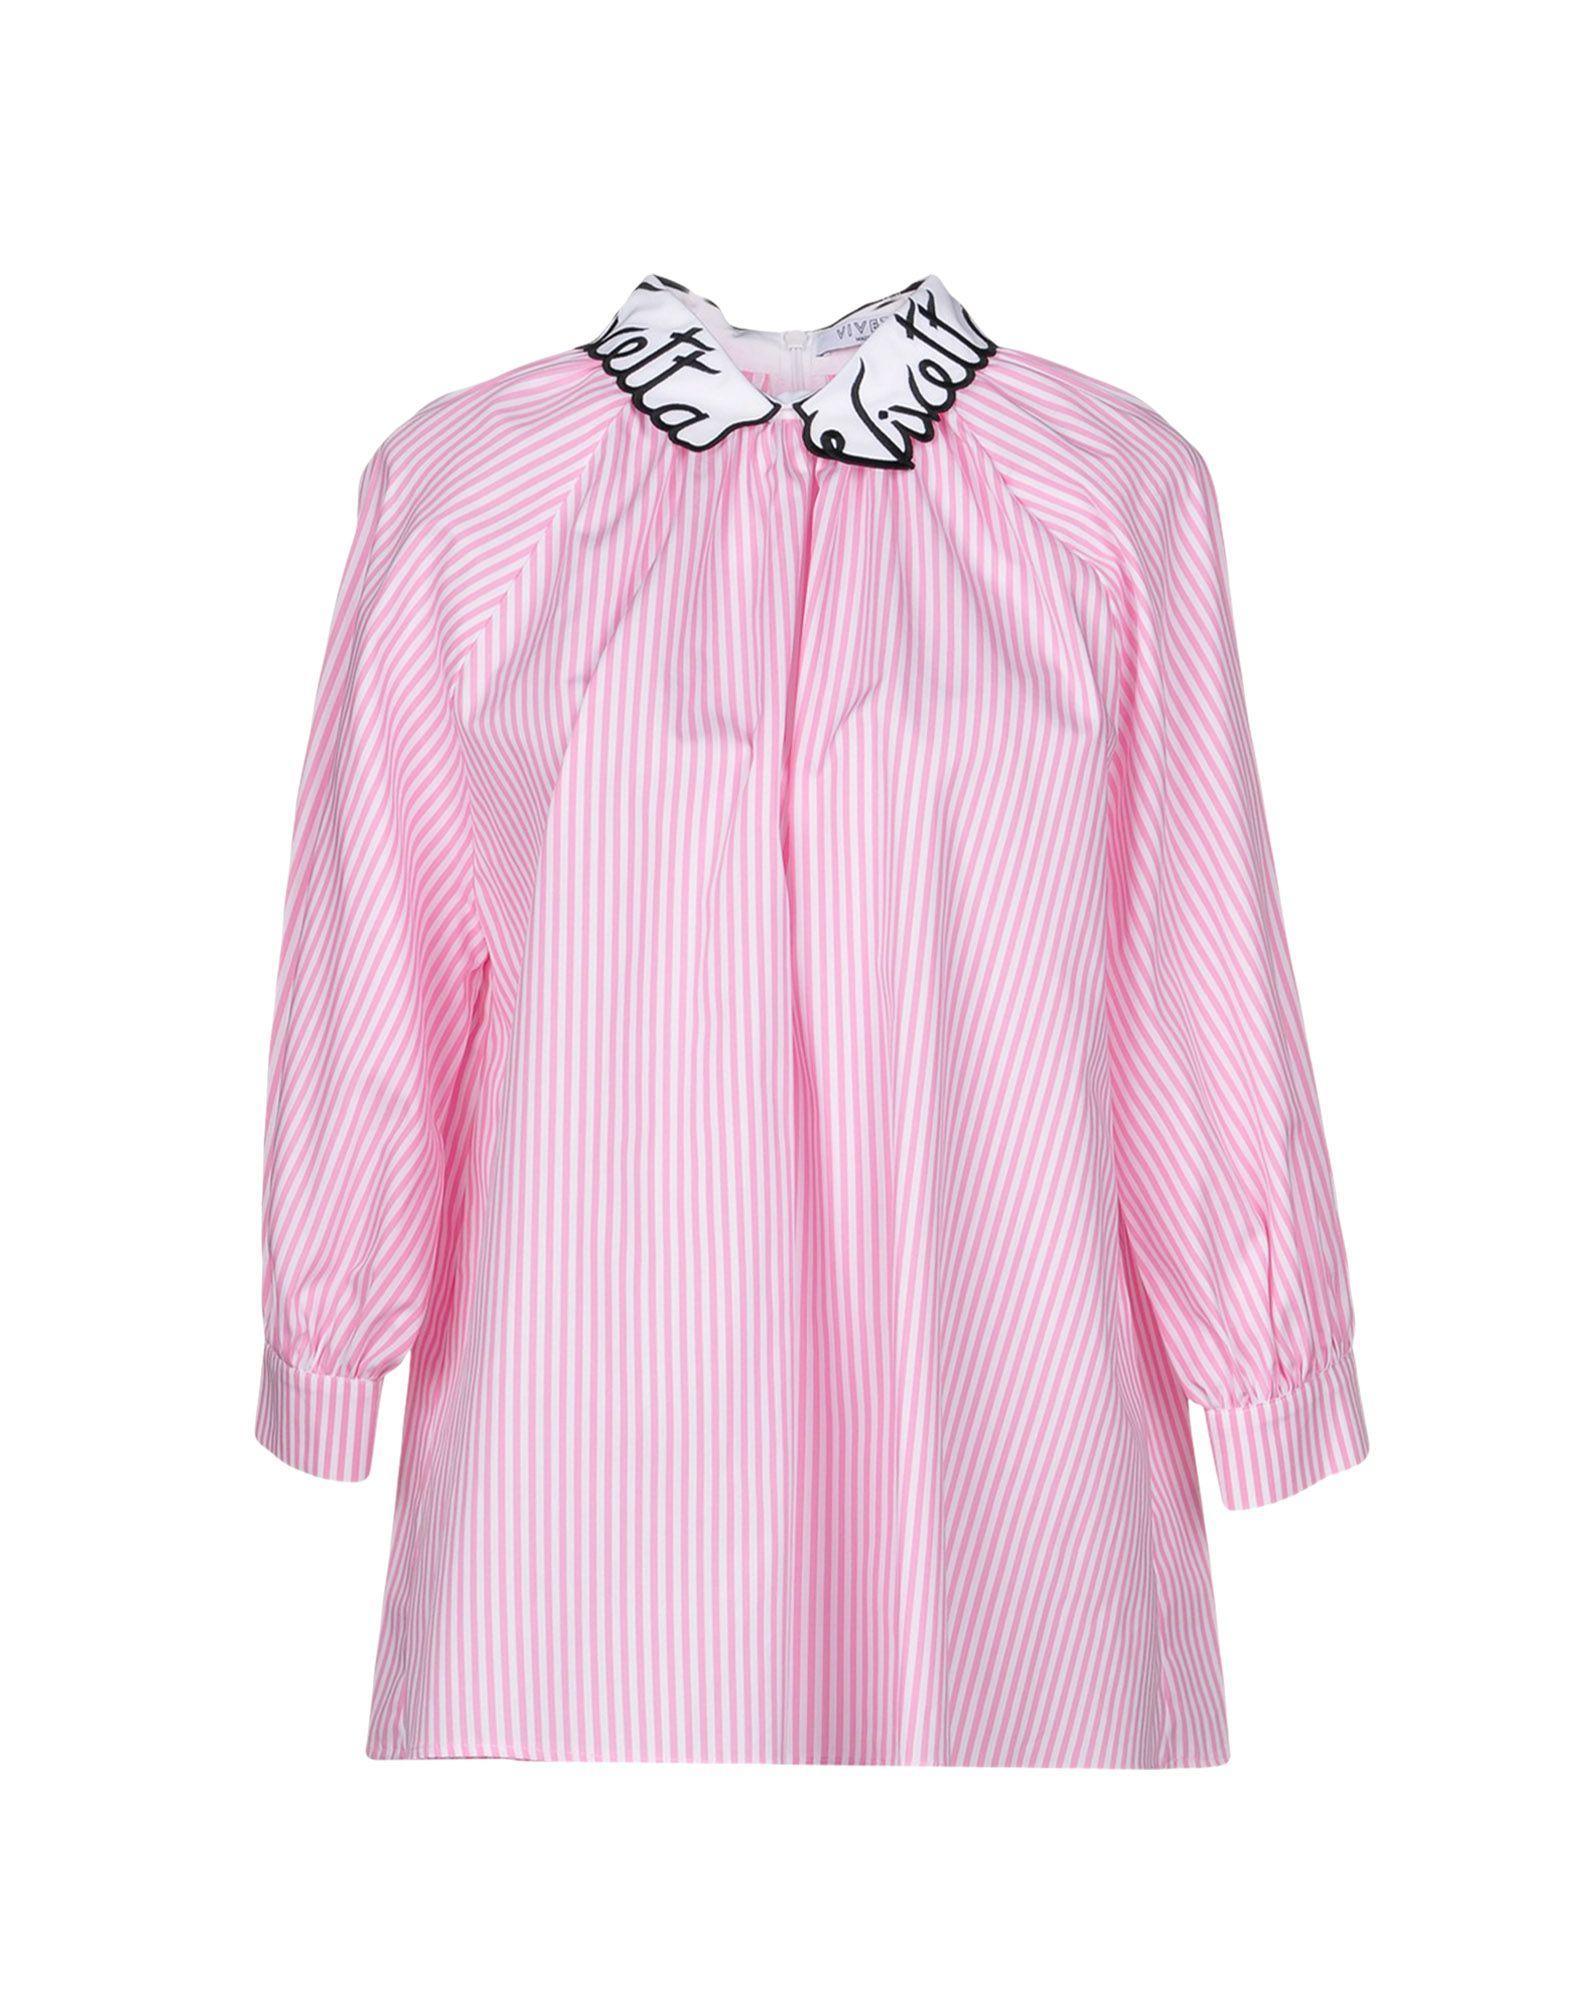 Vivetta Blouse In Pink